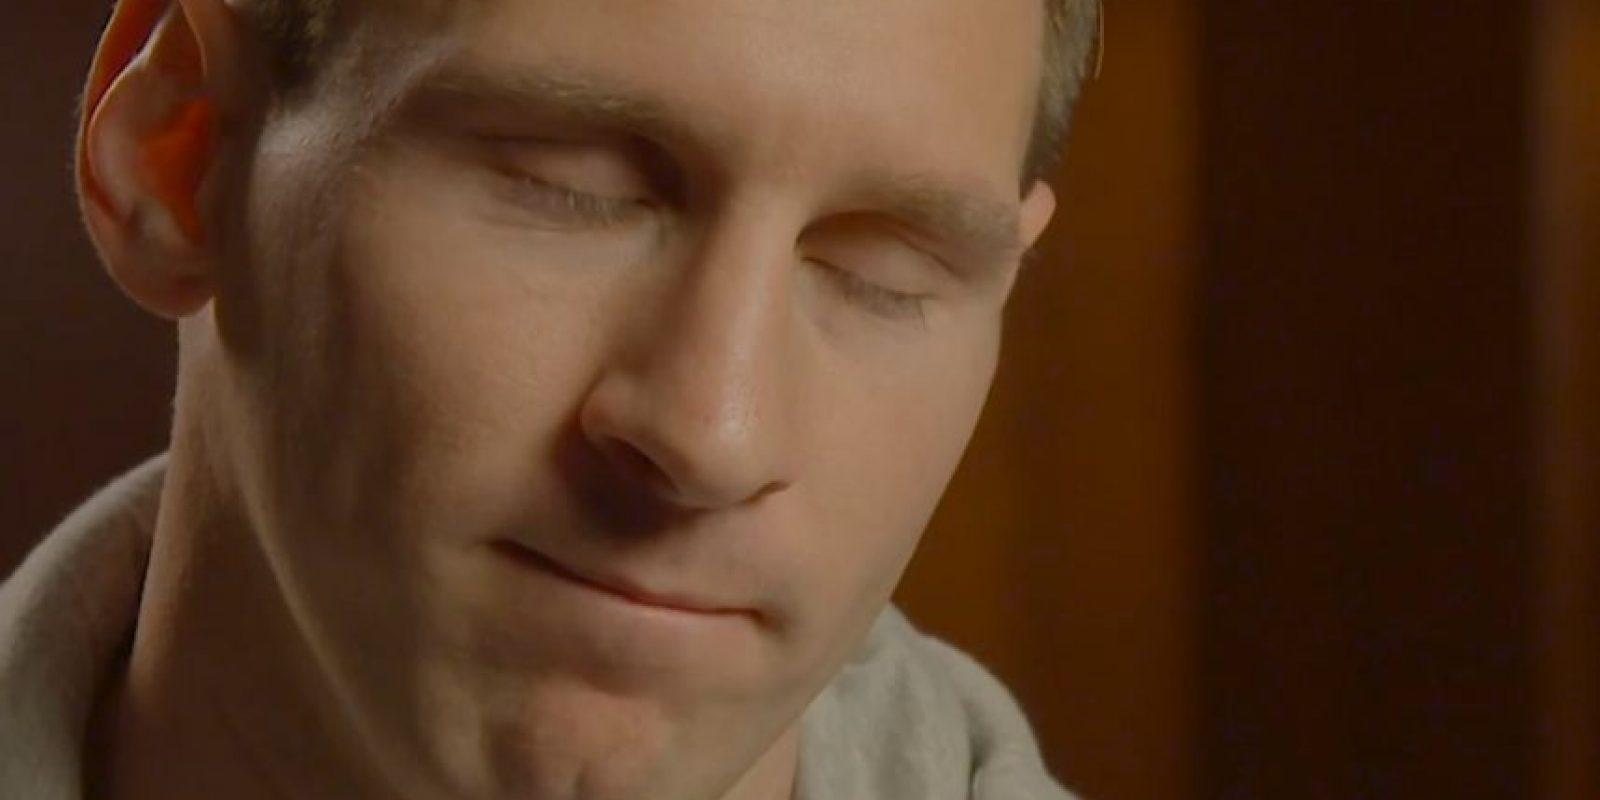 Estuvo al bordo de las lágrimas Foto:Youtube: FIFA